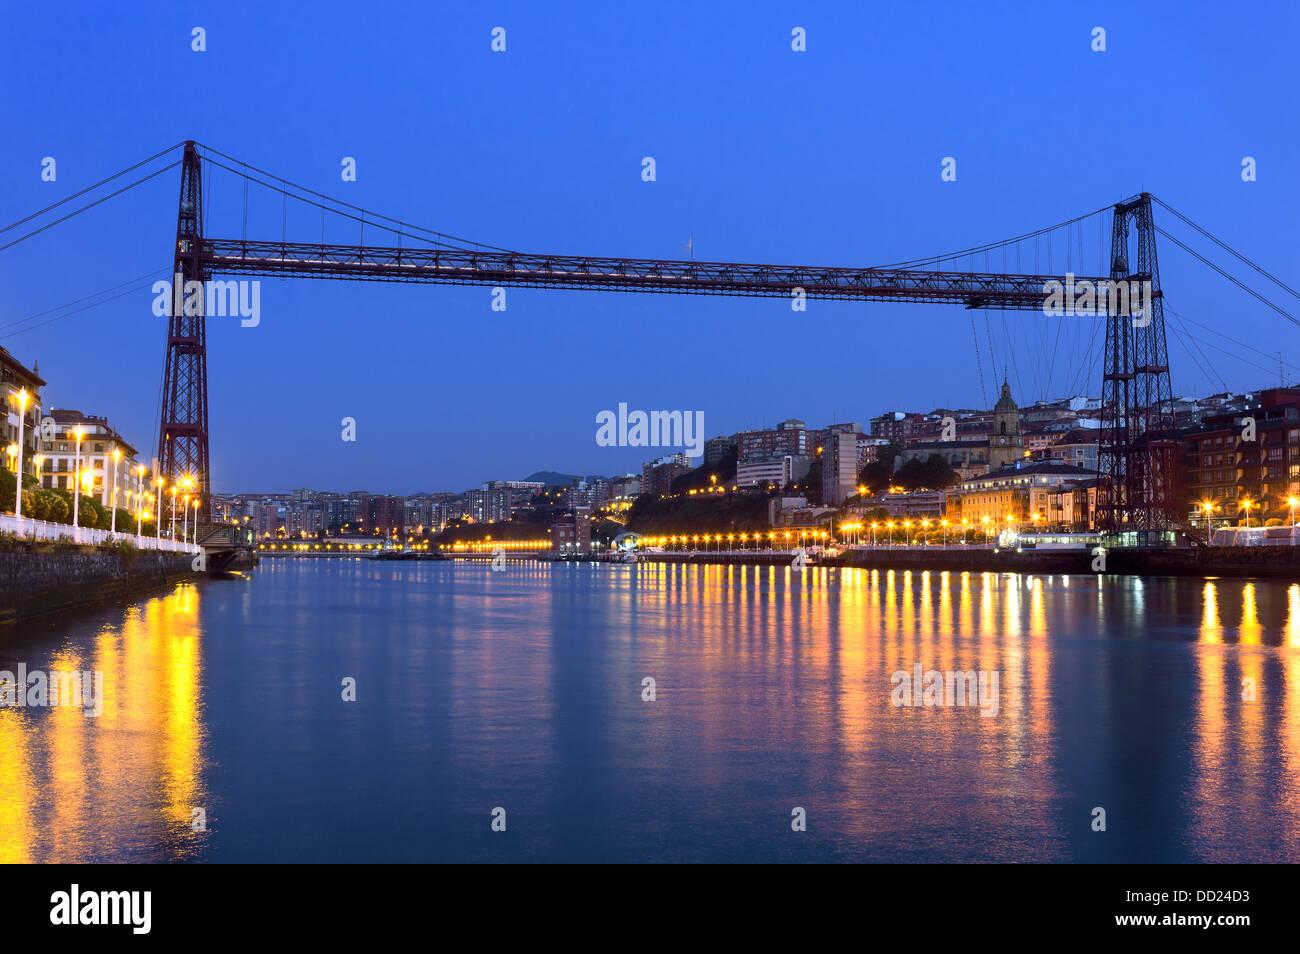 Hanging bridge between Portugalete and Getxo. Vizcaya, Basque Country, Spain - Stock Image